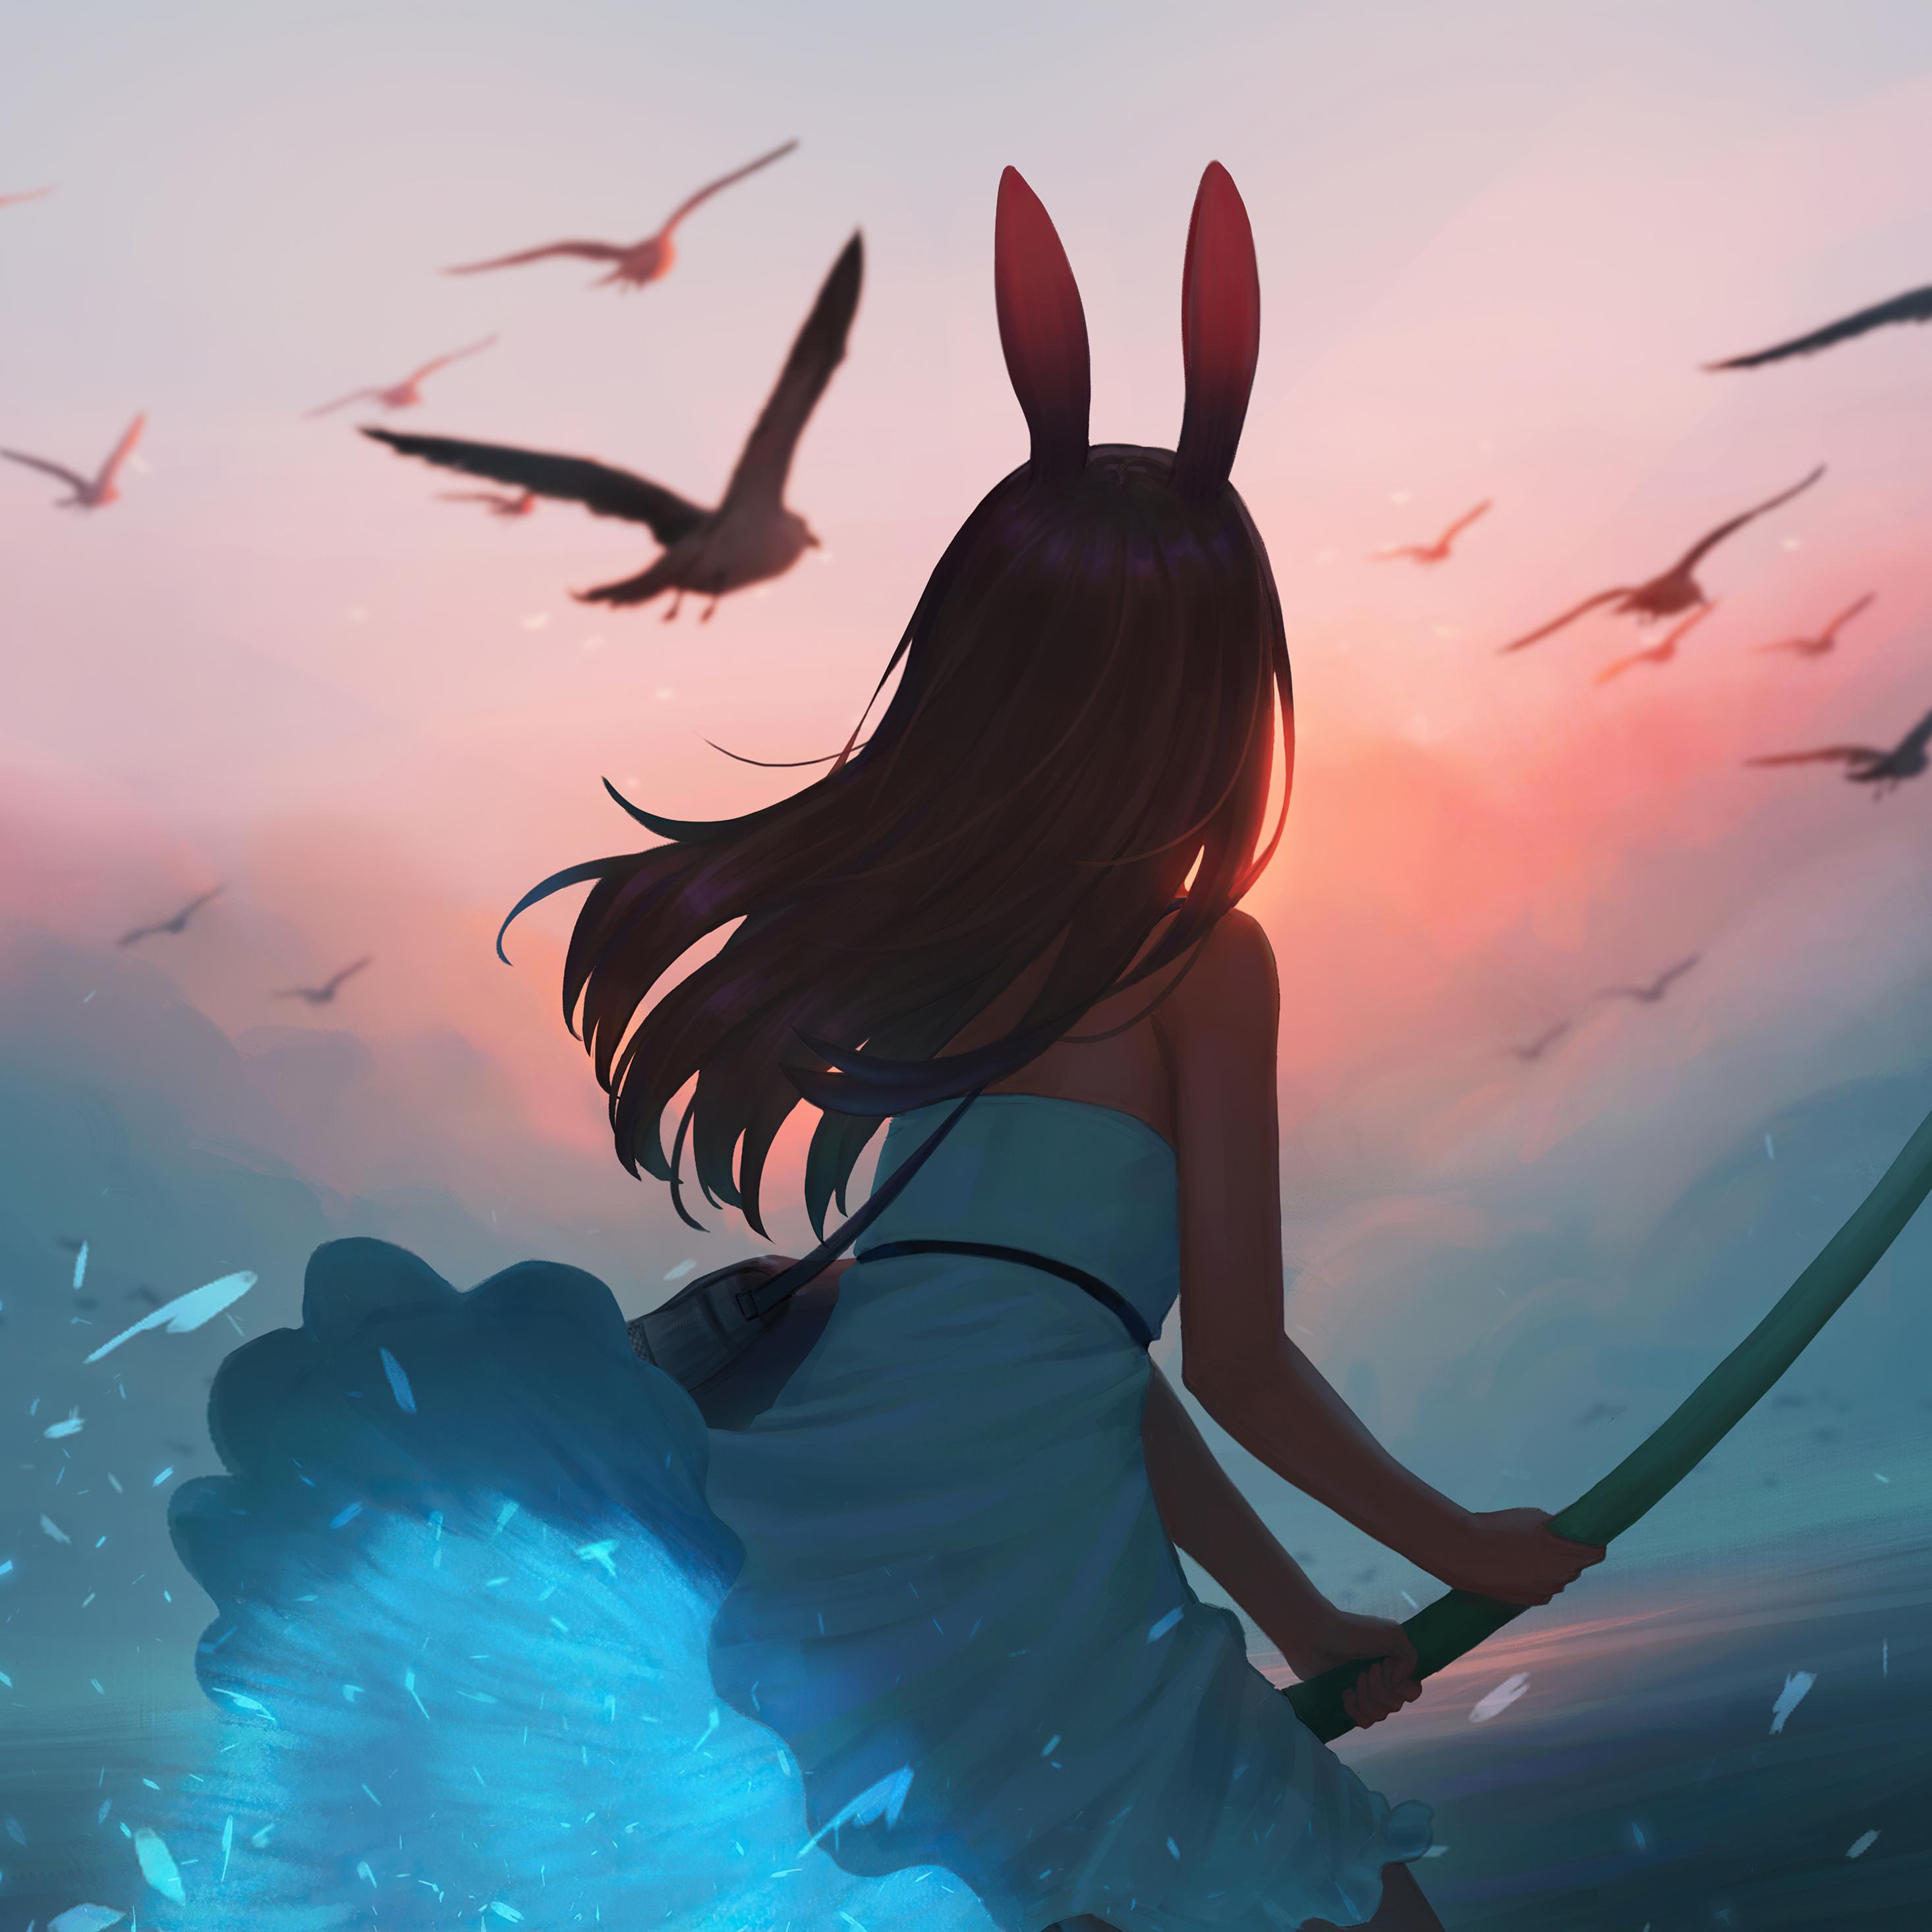 anime-girl-bunny-hairs-5k-0l.jpg